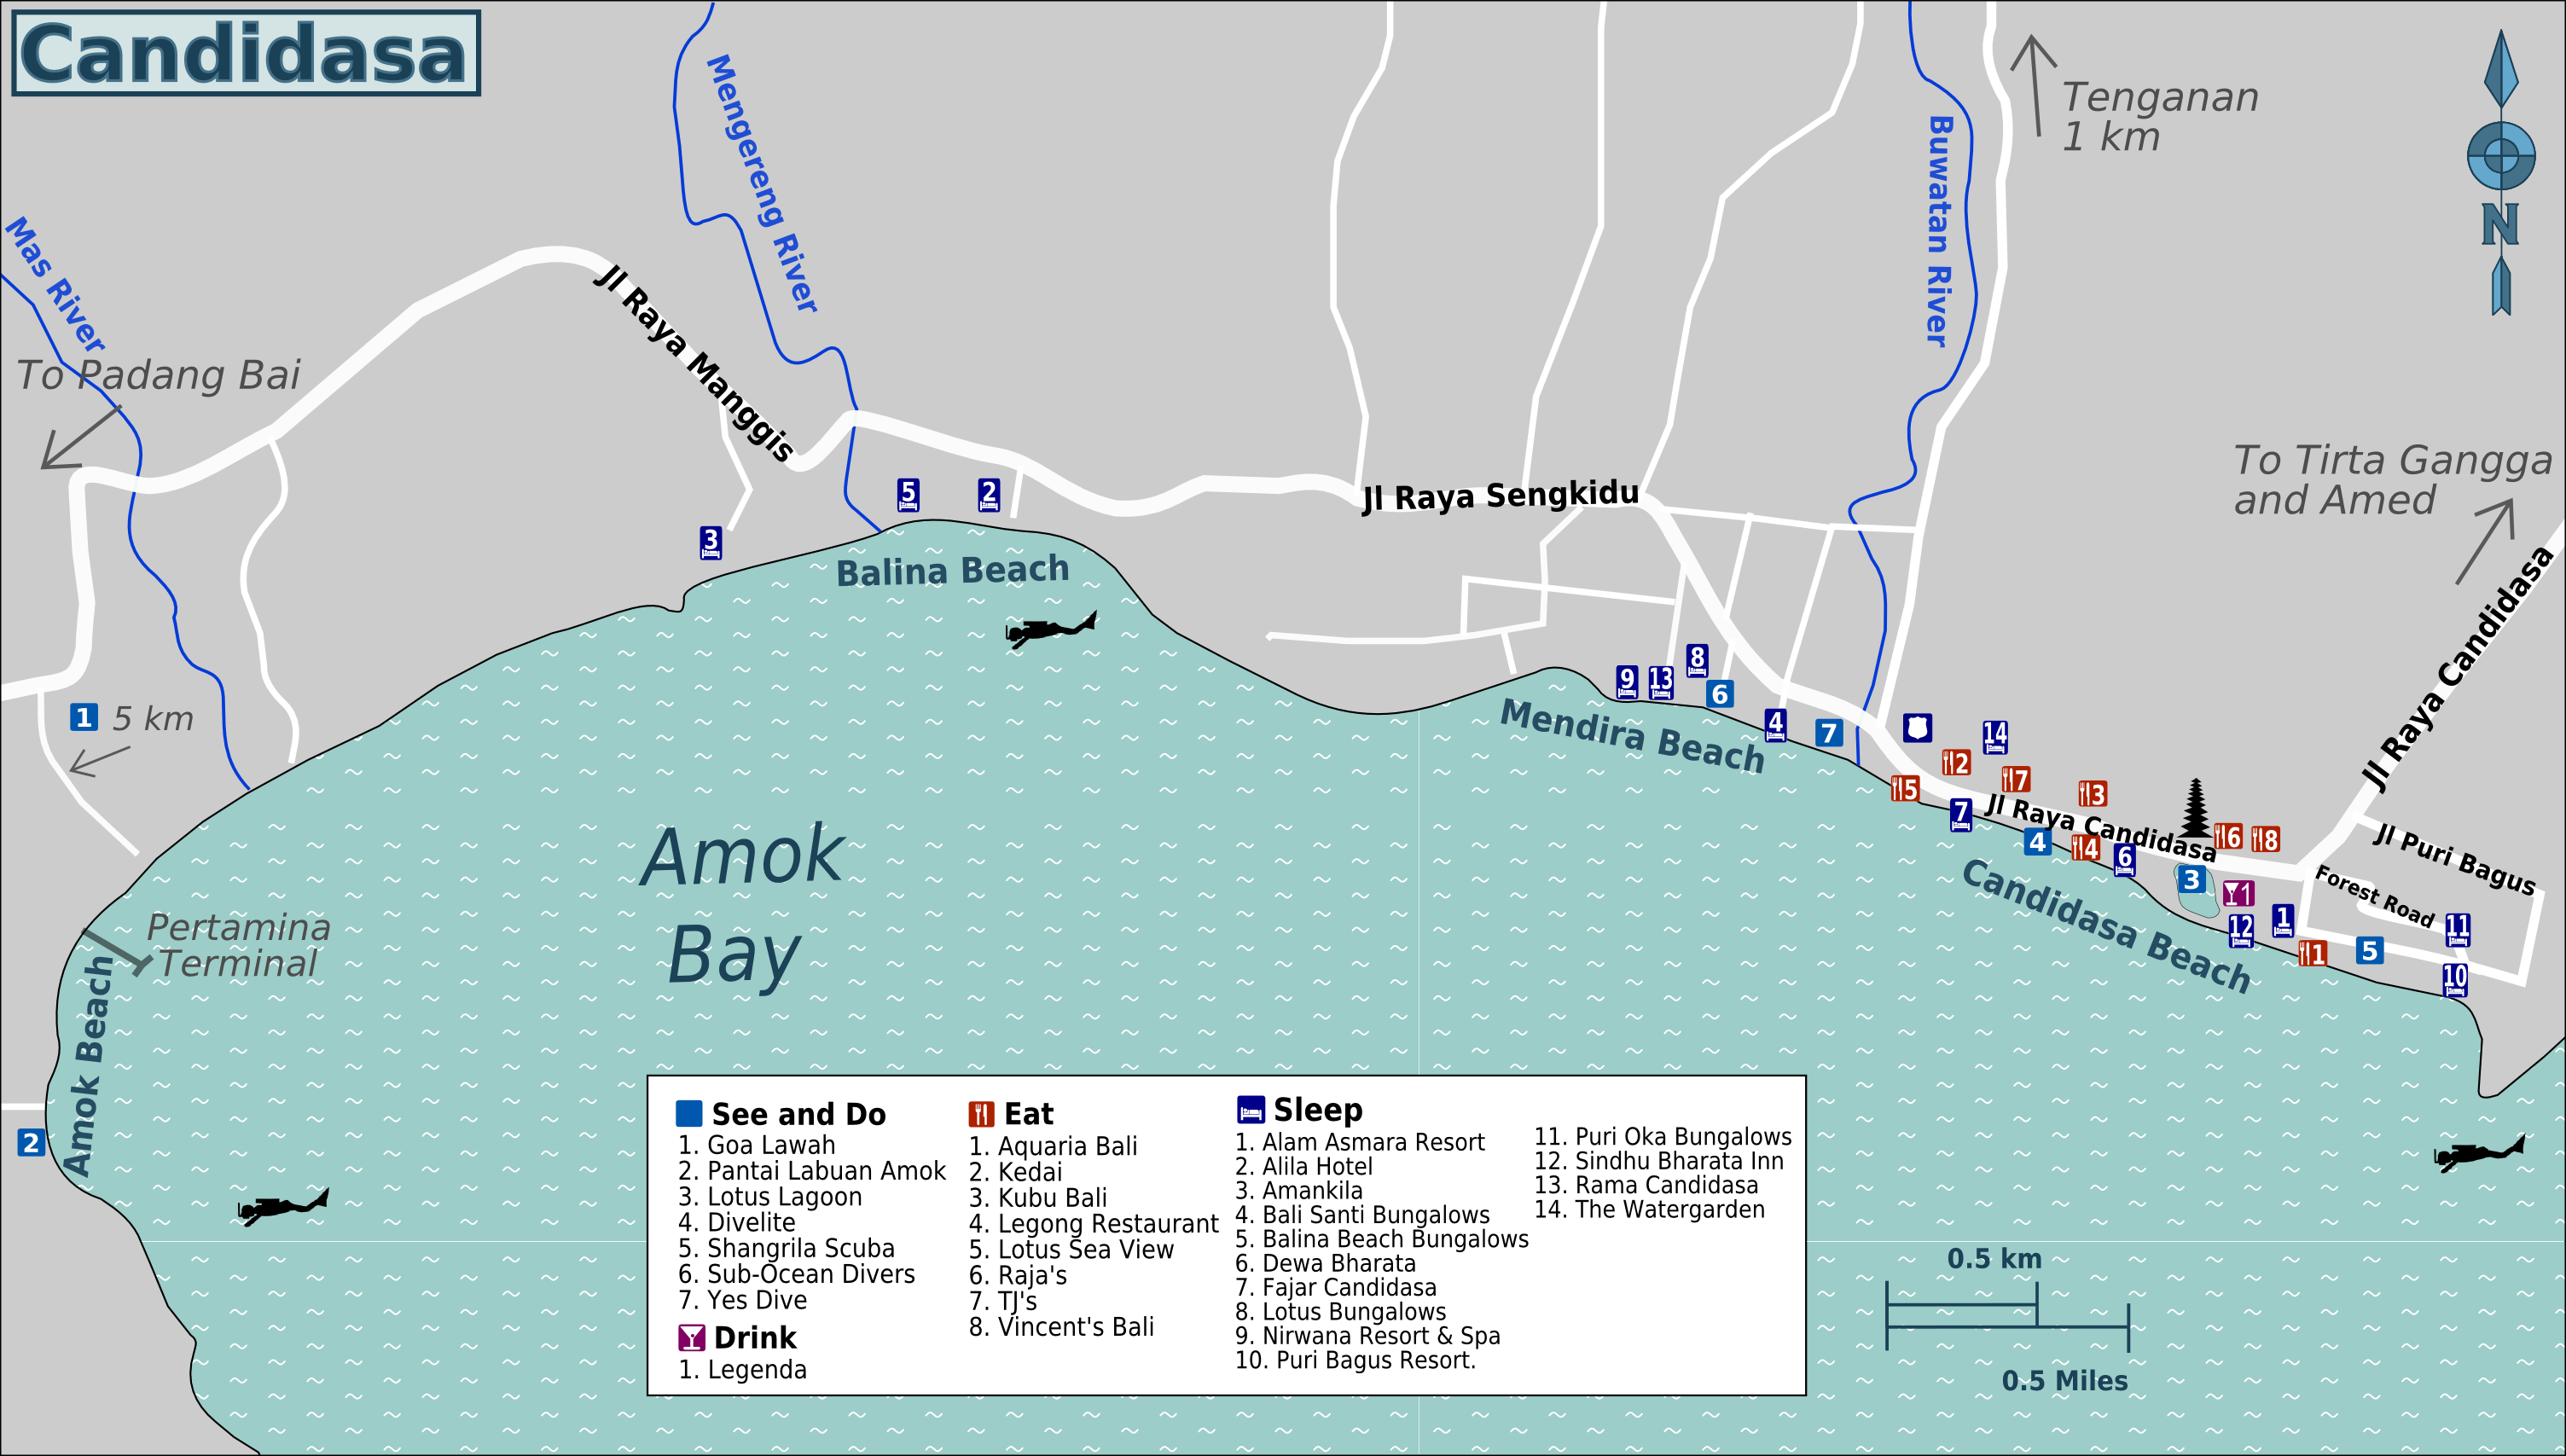 candidasa map